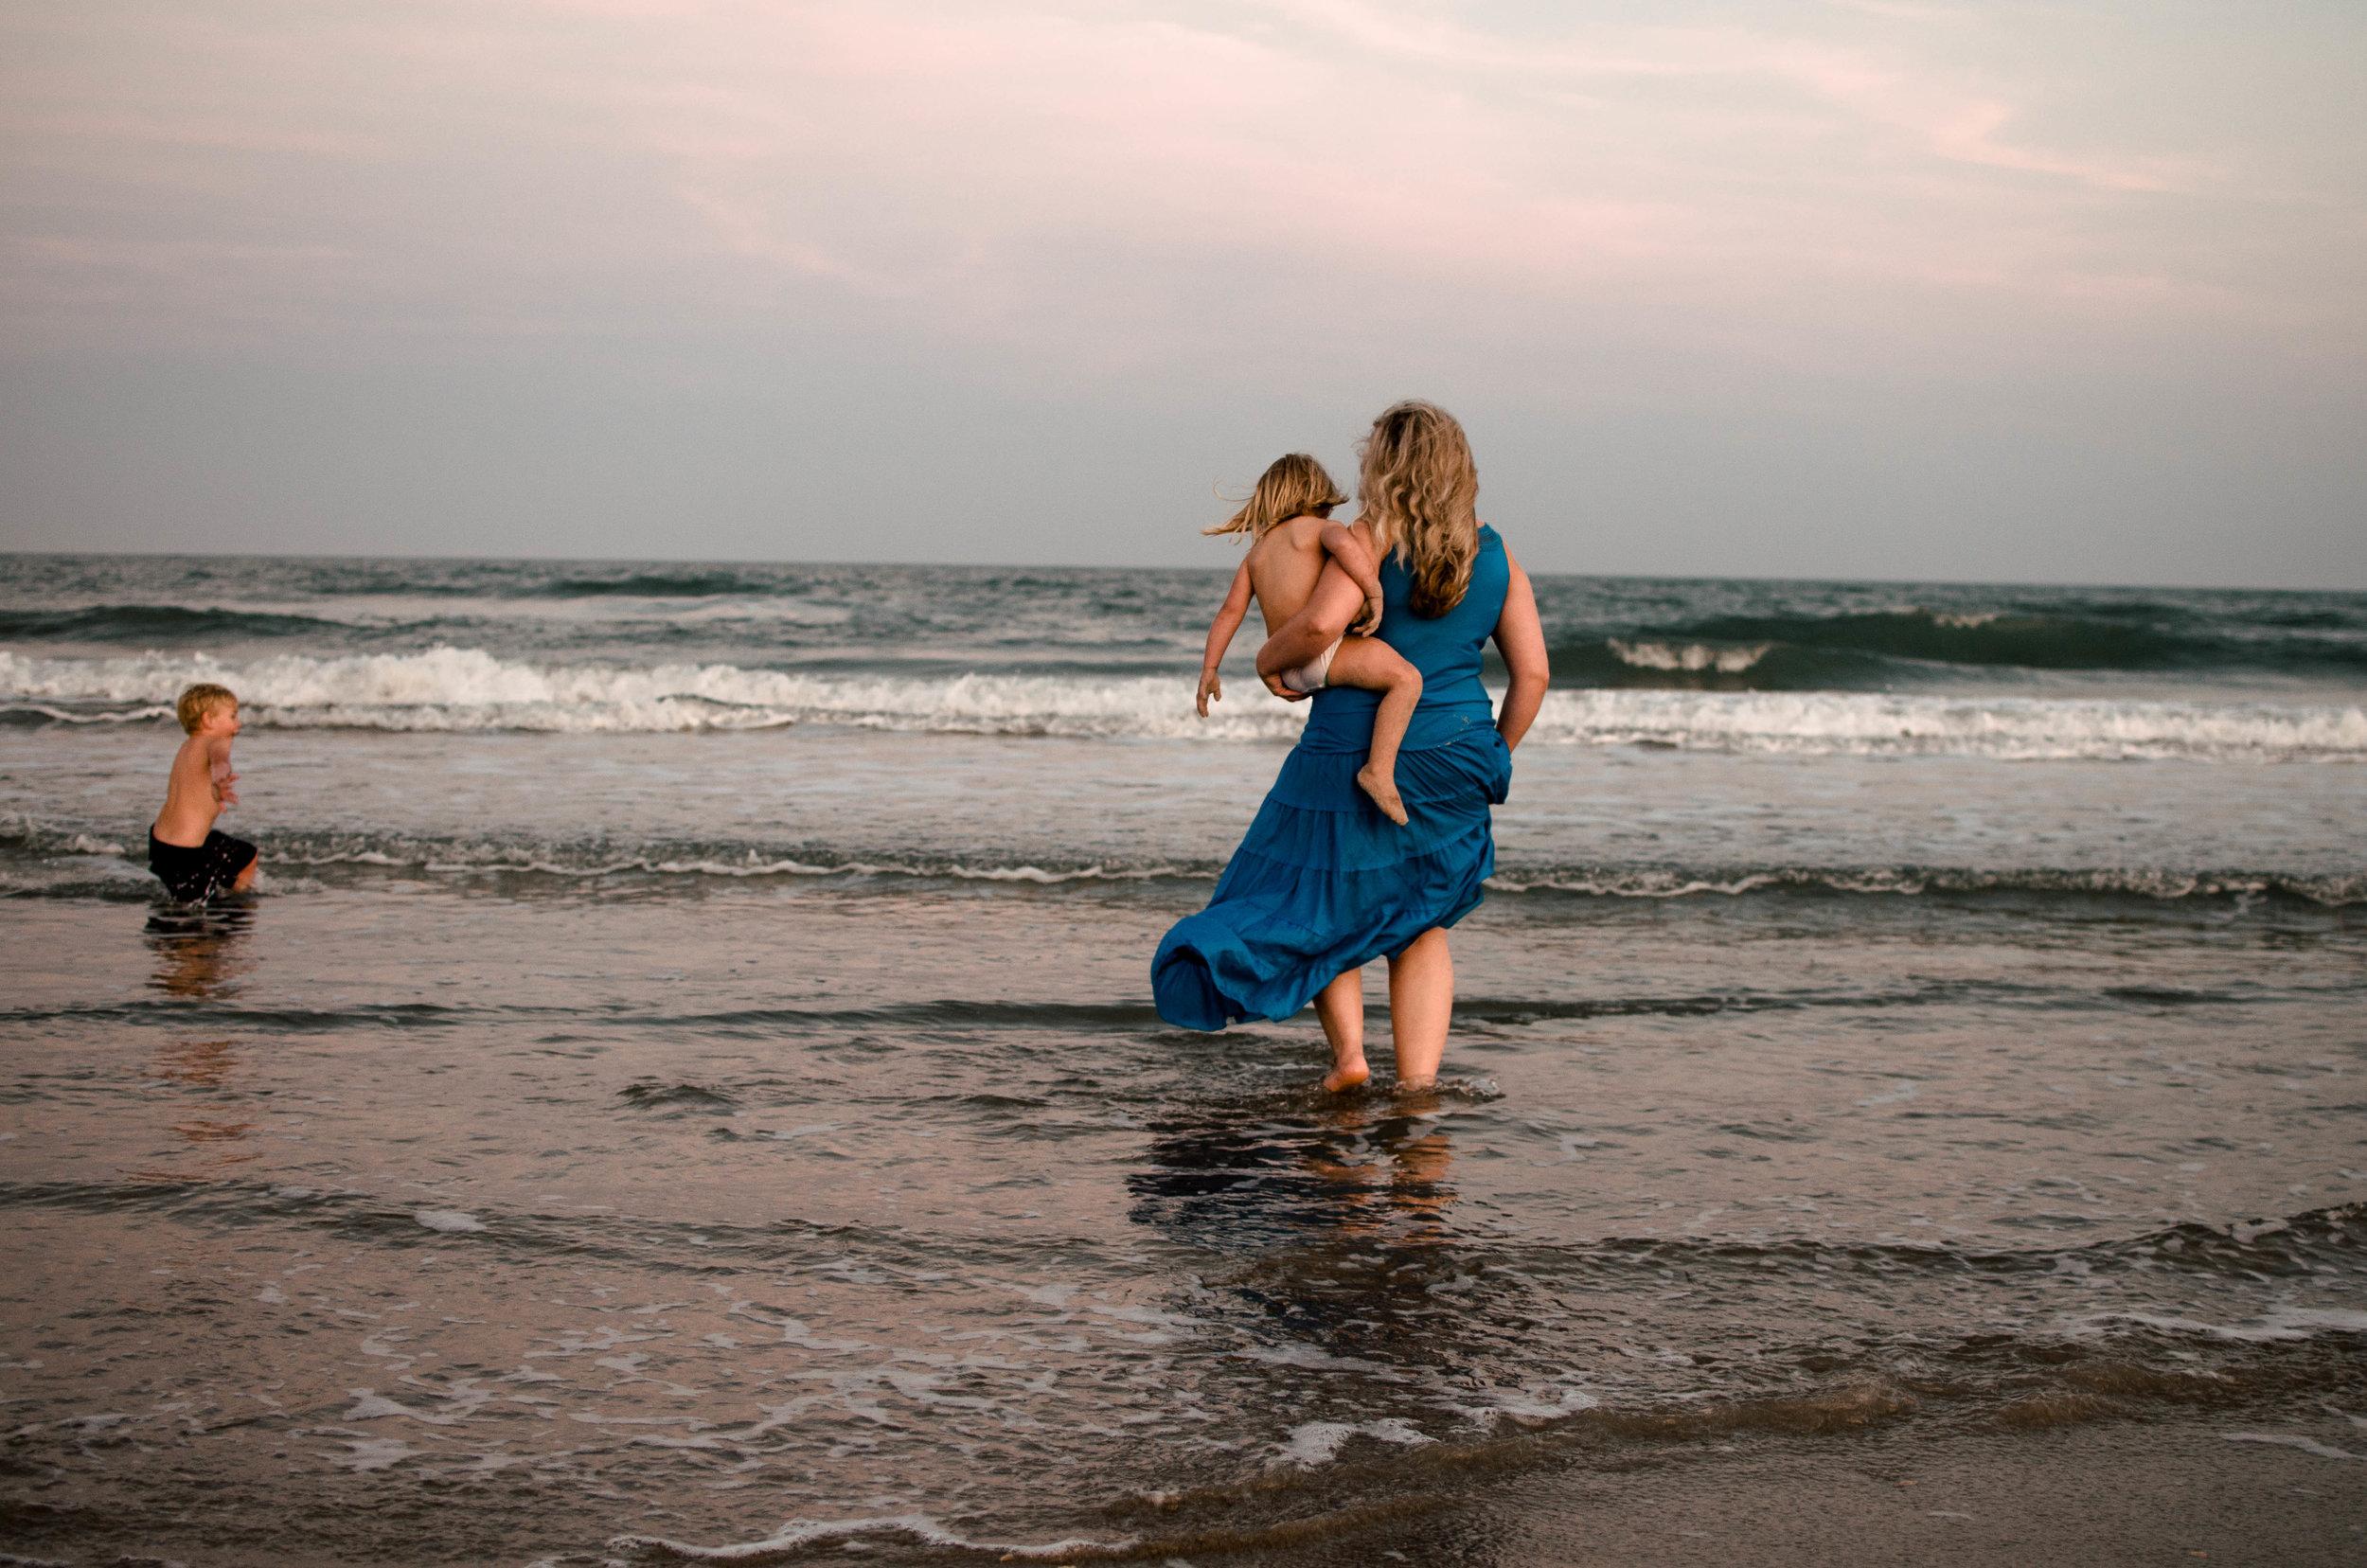 Assateague Island Photographer - Family Photographer - Pittsburgh Family Photographer - Beach Photography-2896.jpg